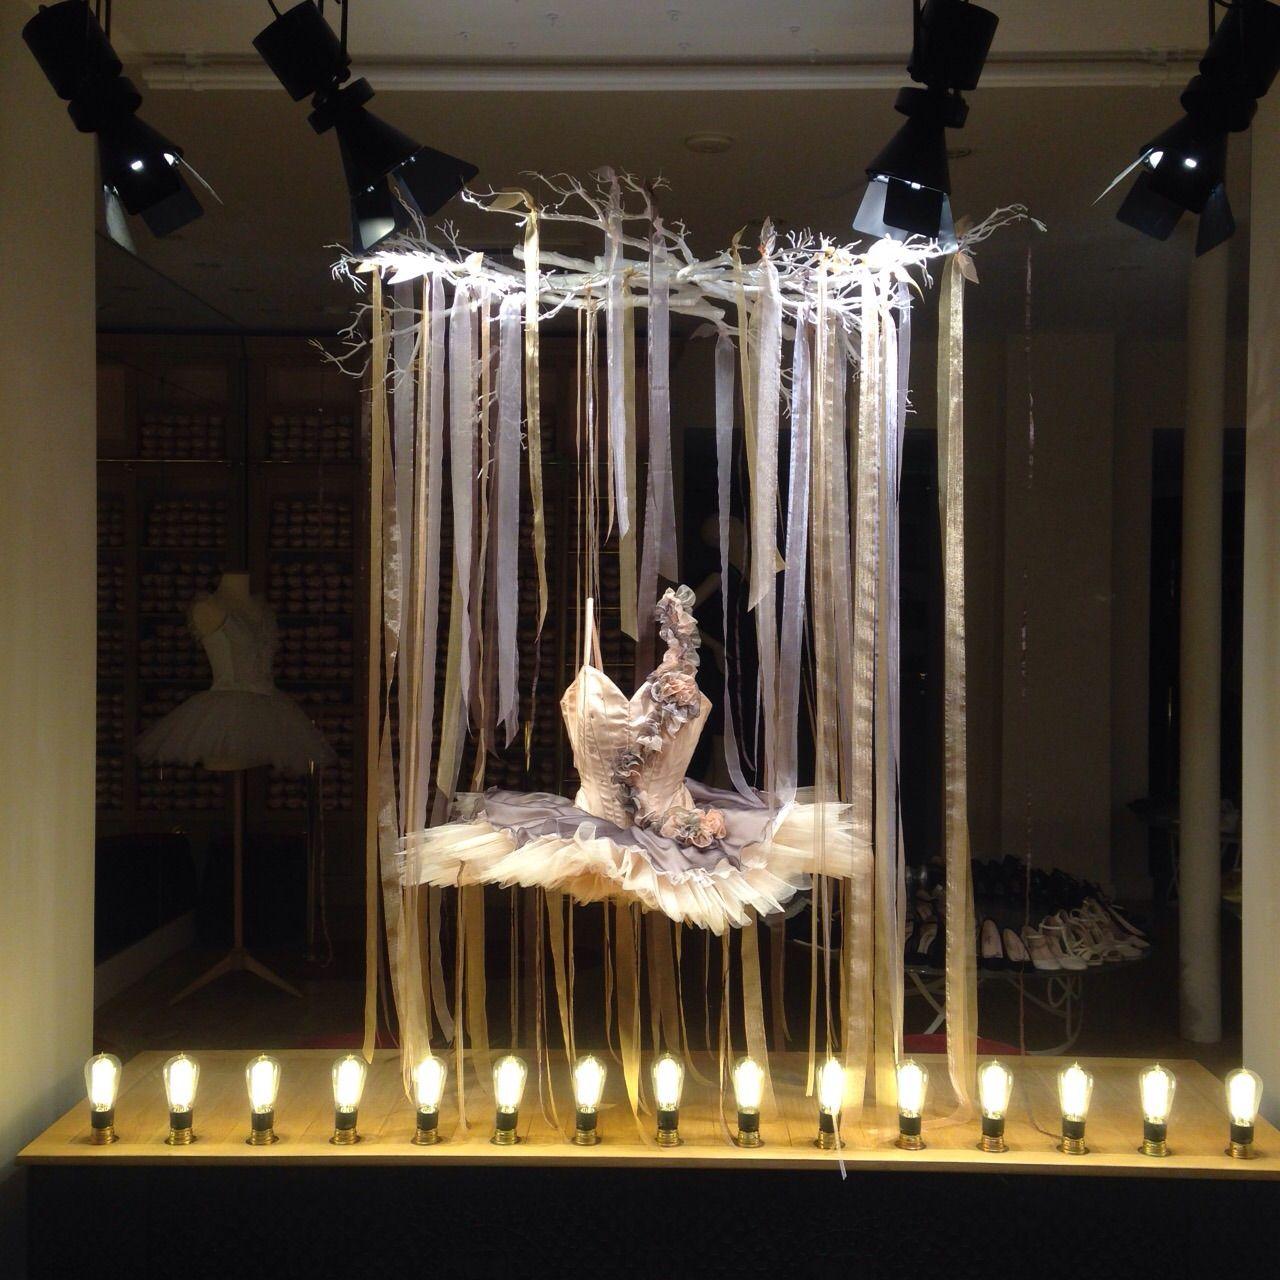 repetto schaufenster aurora in paris visual mavis world schaufenster pinte. Black Bedroom Furniture Sets. Home Design Ideas